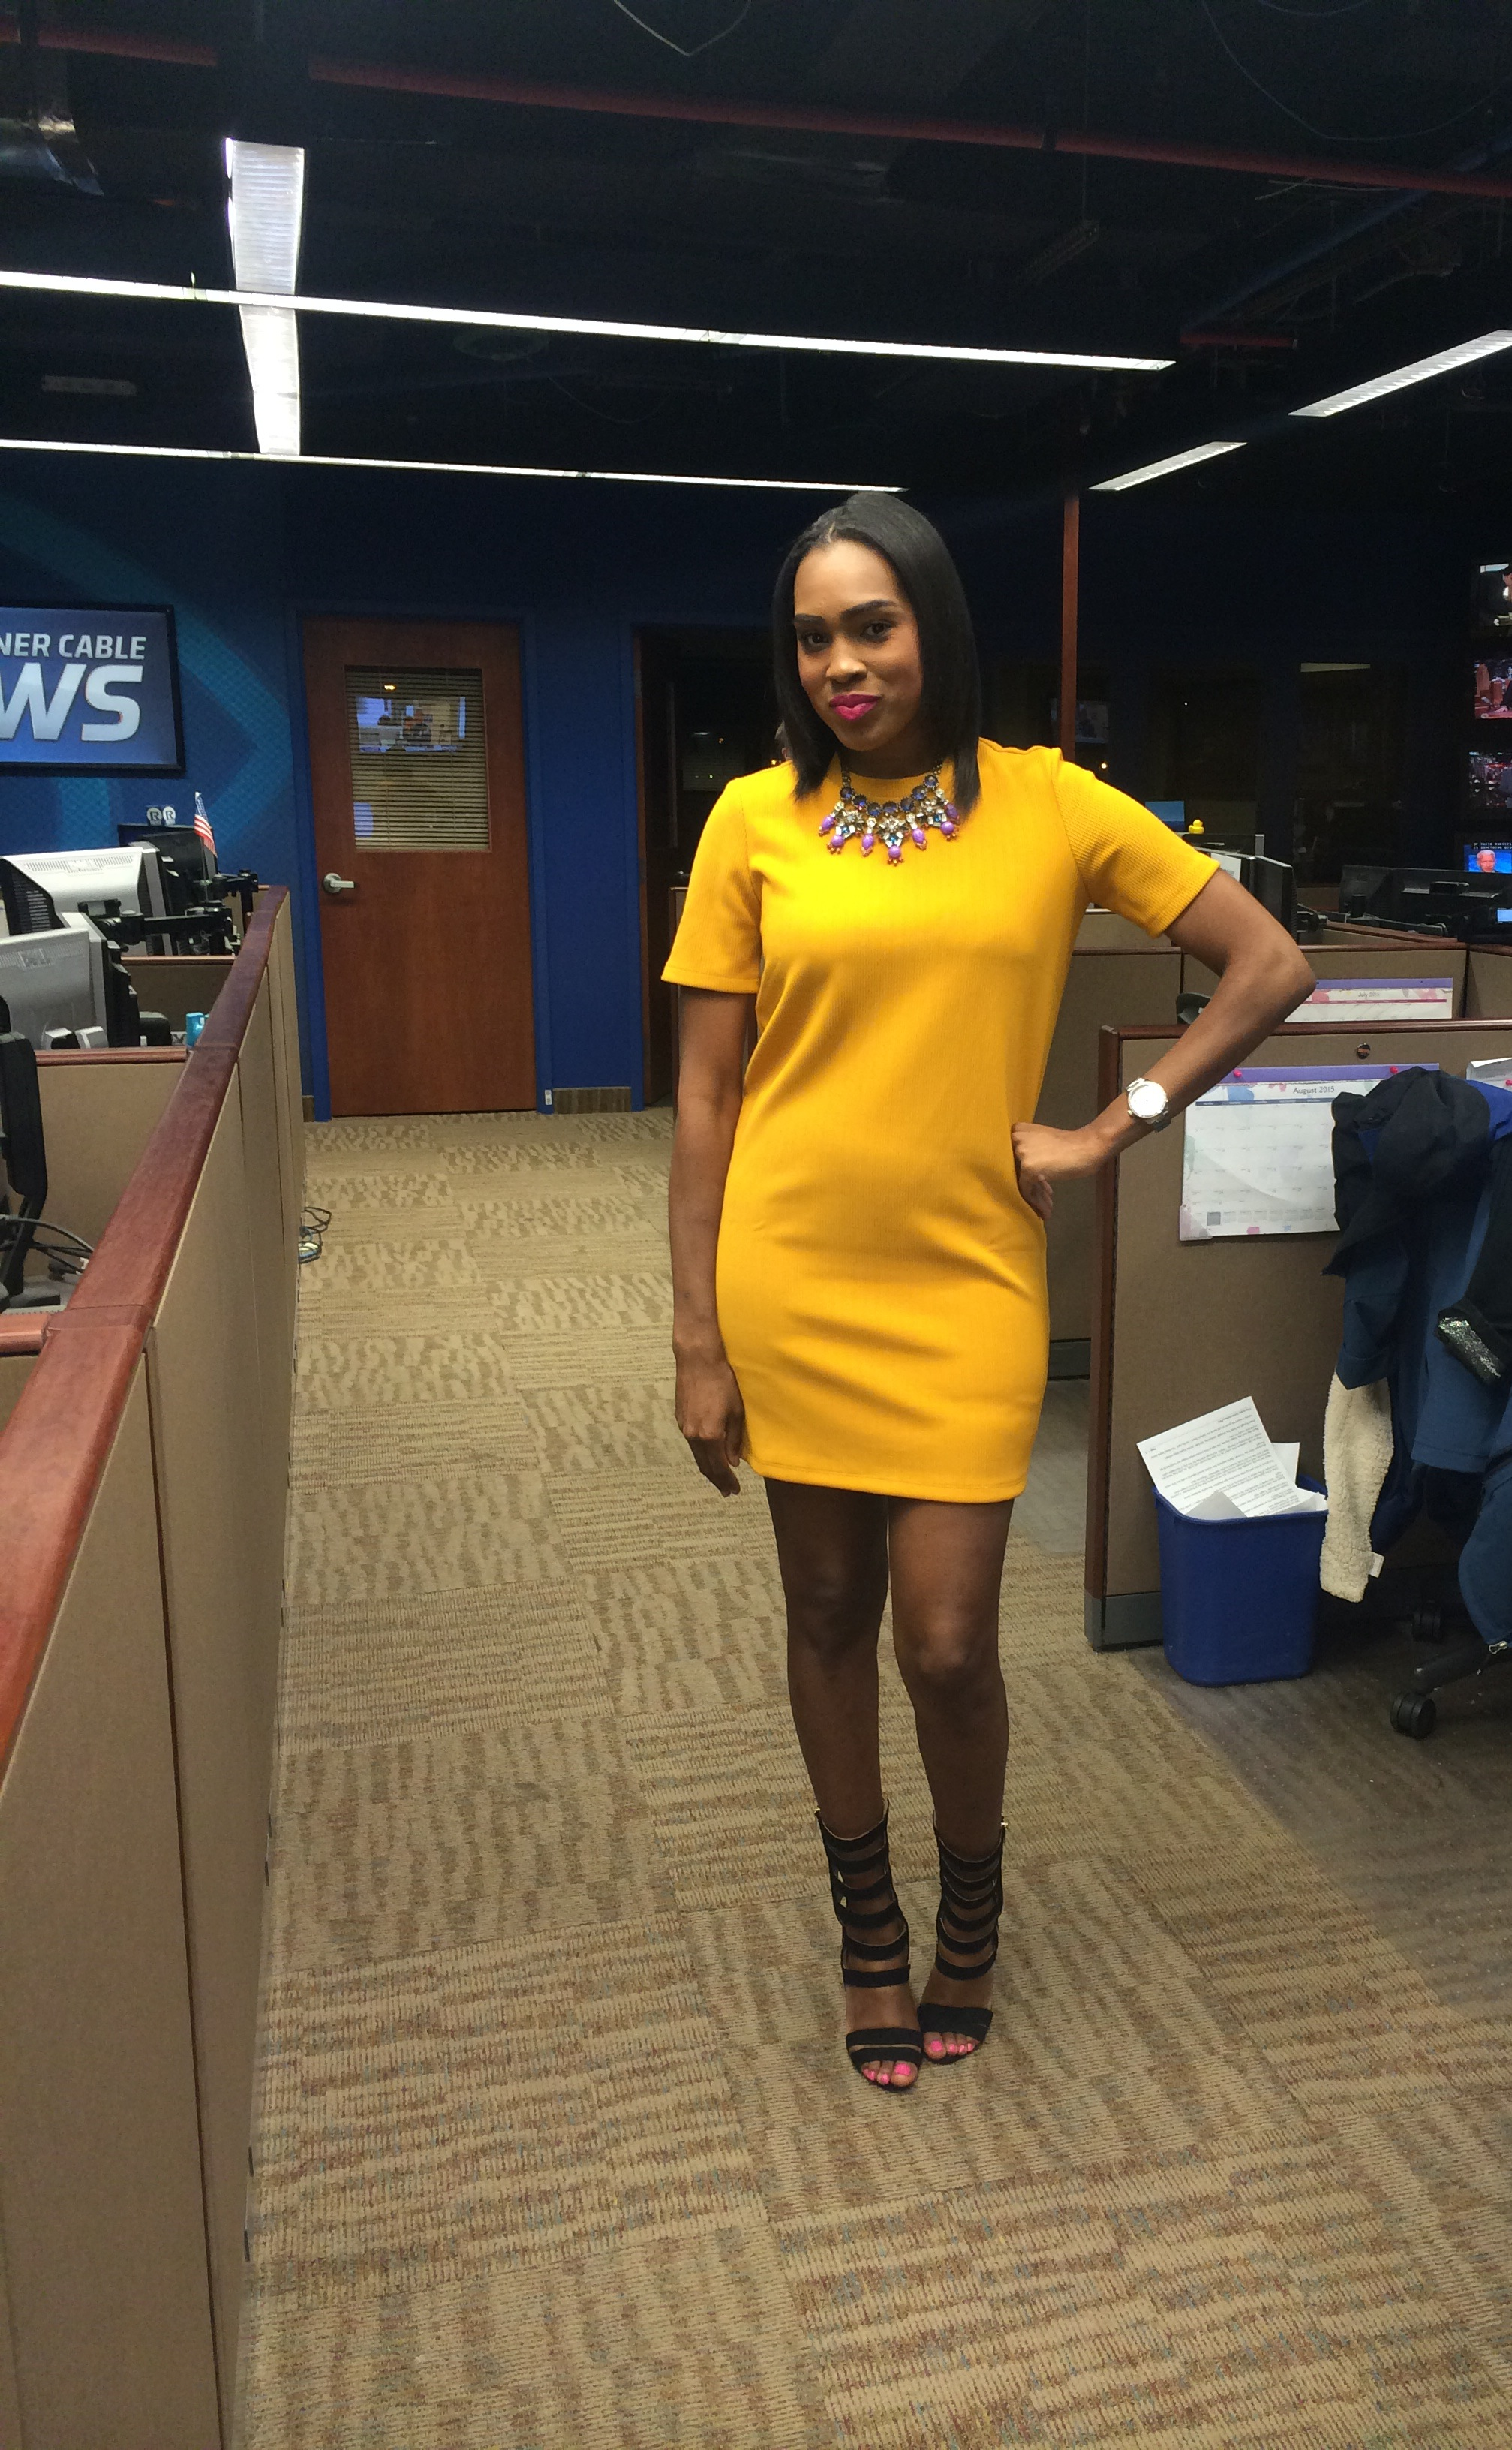 Style-files-forever-21-mustard-textured-stripe-shift-dress-justfab-florernce-heels-oohlalablog-workwear-